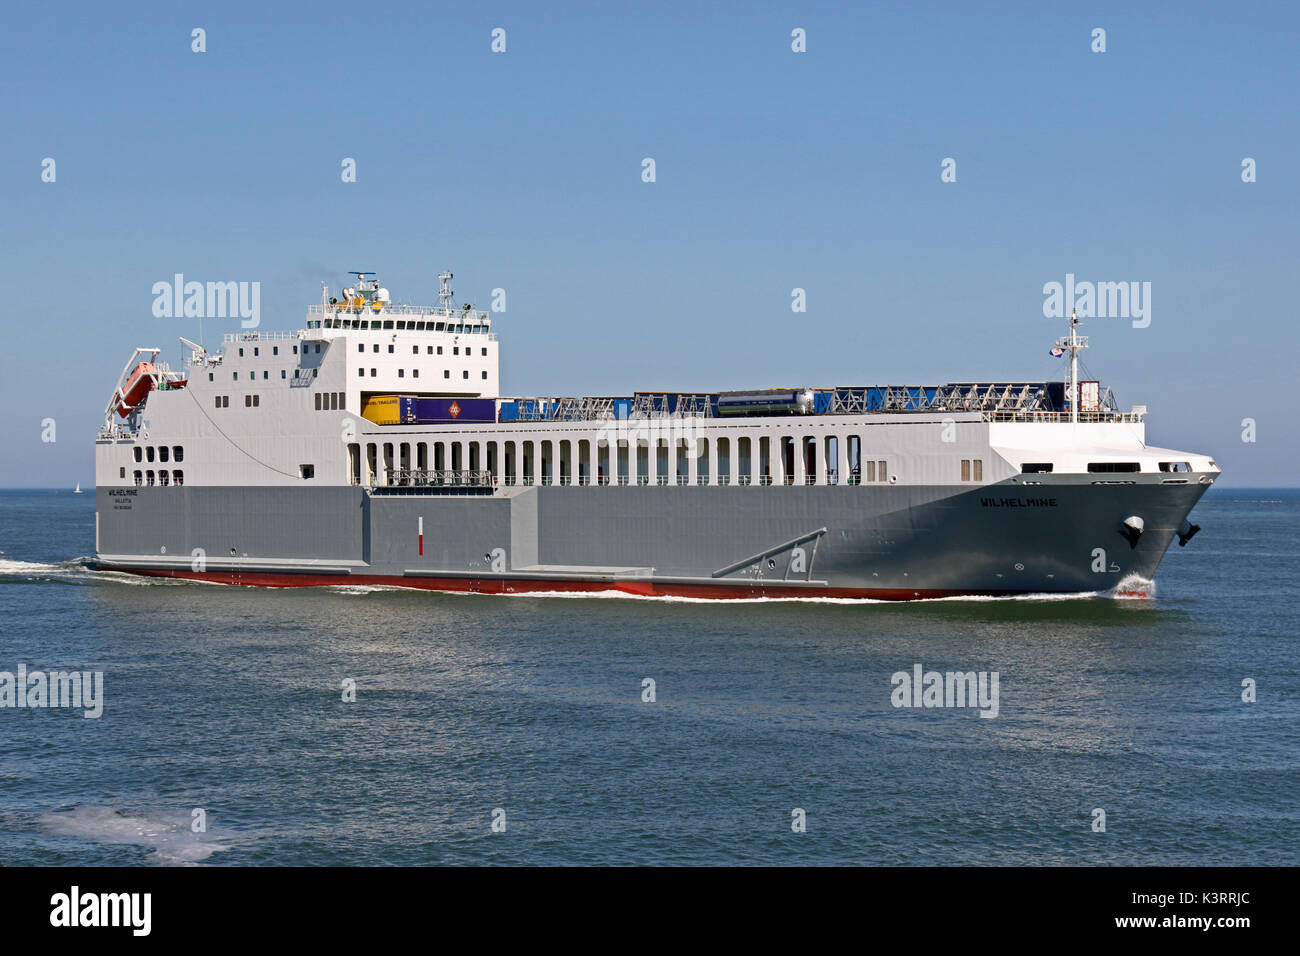 The Ro-Ro ship Wilhelmine enters the port of Rotterdam. - Stock Image